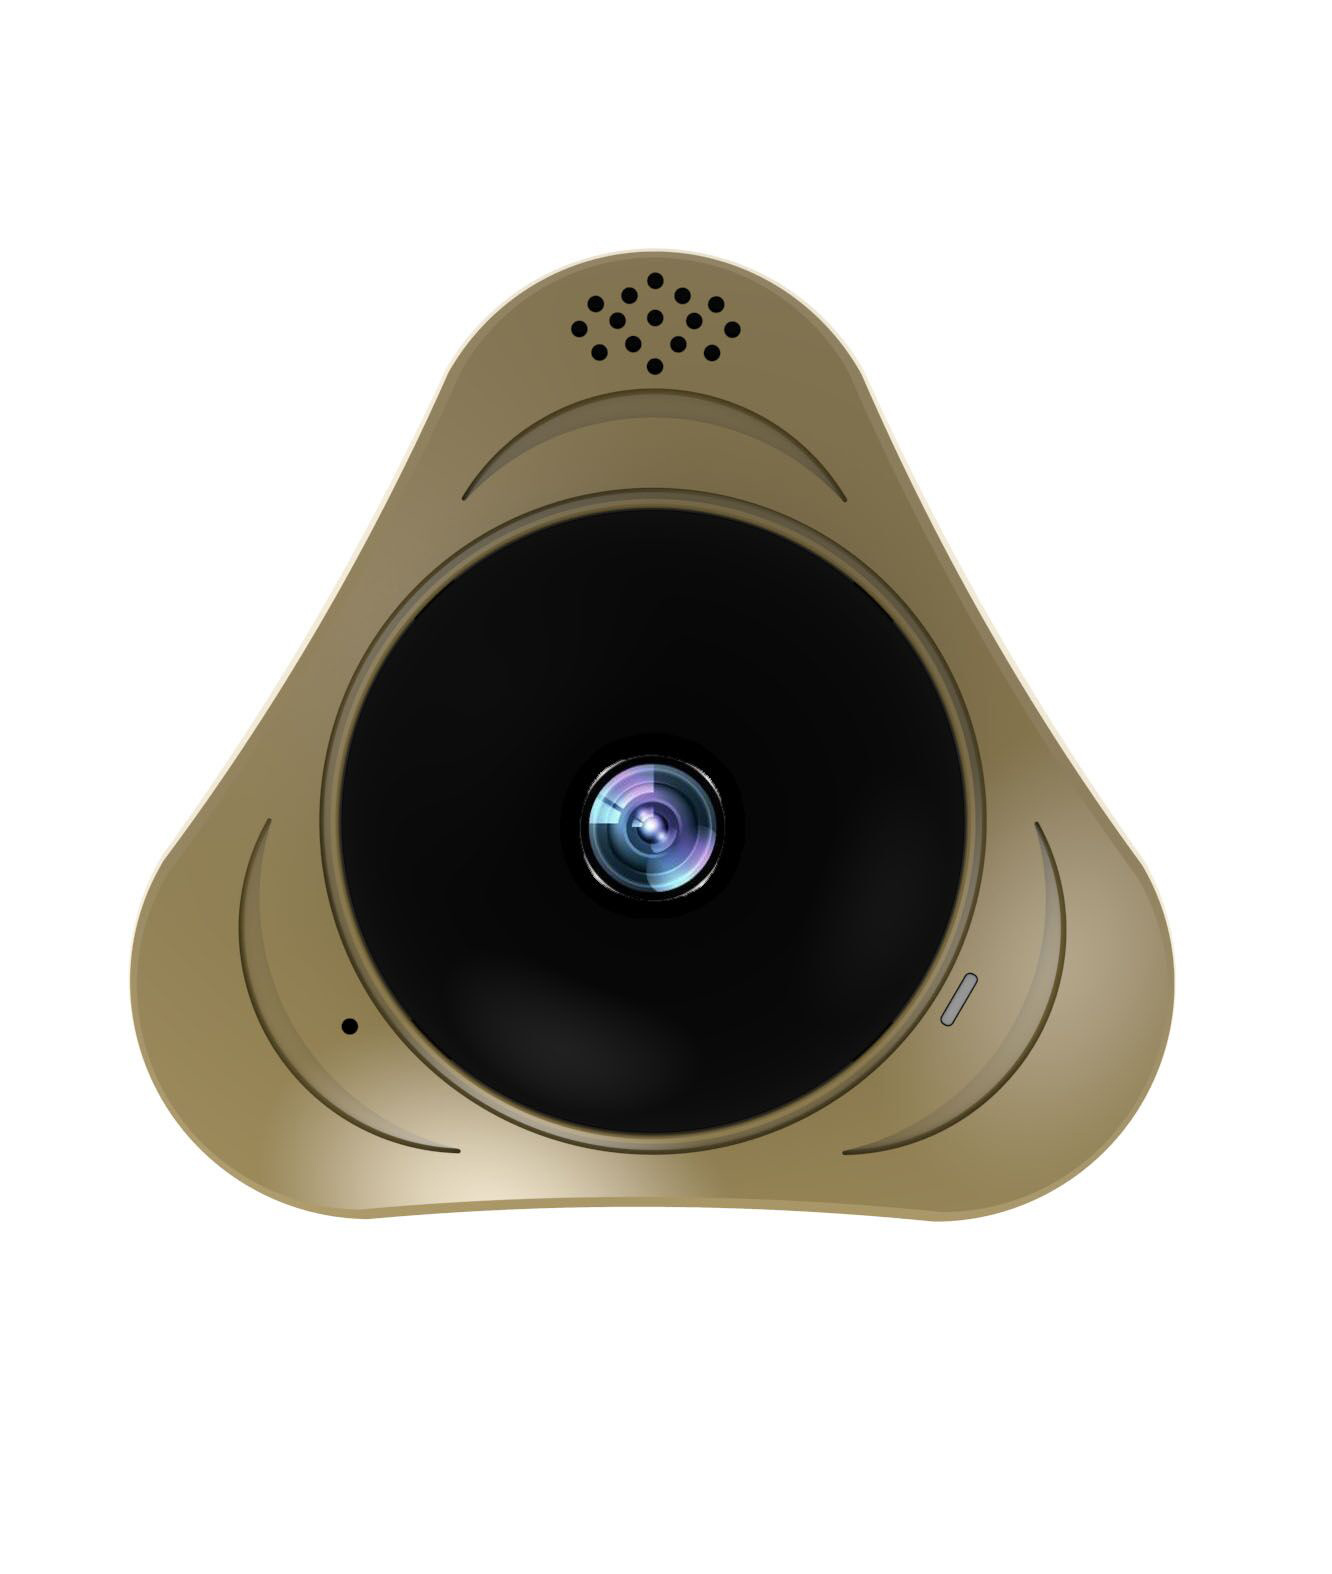 [Hot Item] Toesee 360 Degree Panoramic WiFi Camera with HD 960p Wireless Vr  3D Panorama IP Camera P2p Security Wi-Fi Camera APP Yoosee